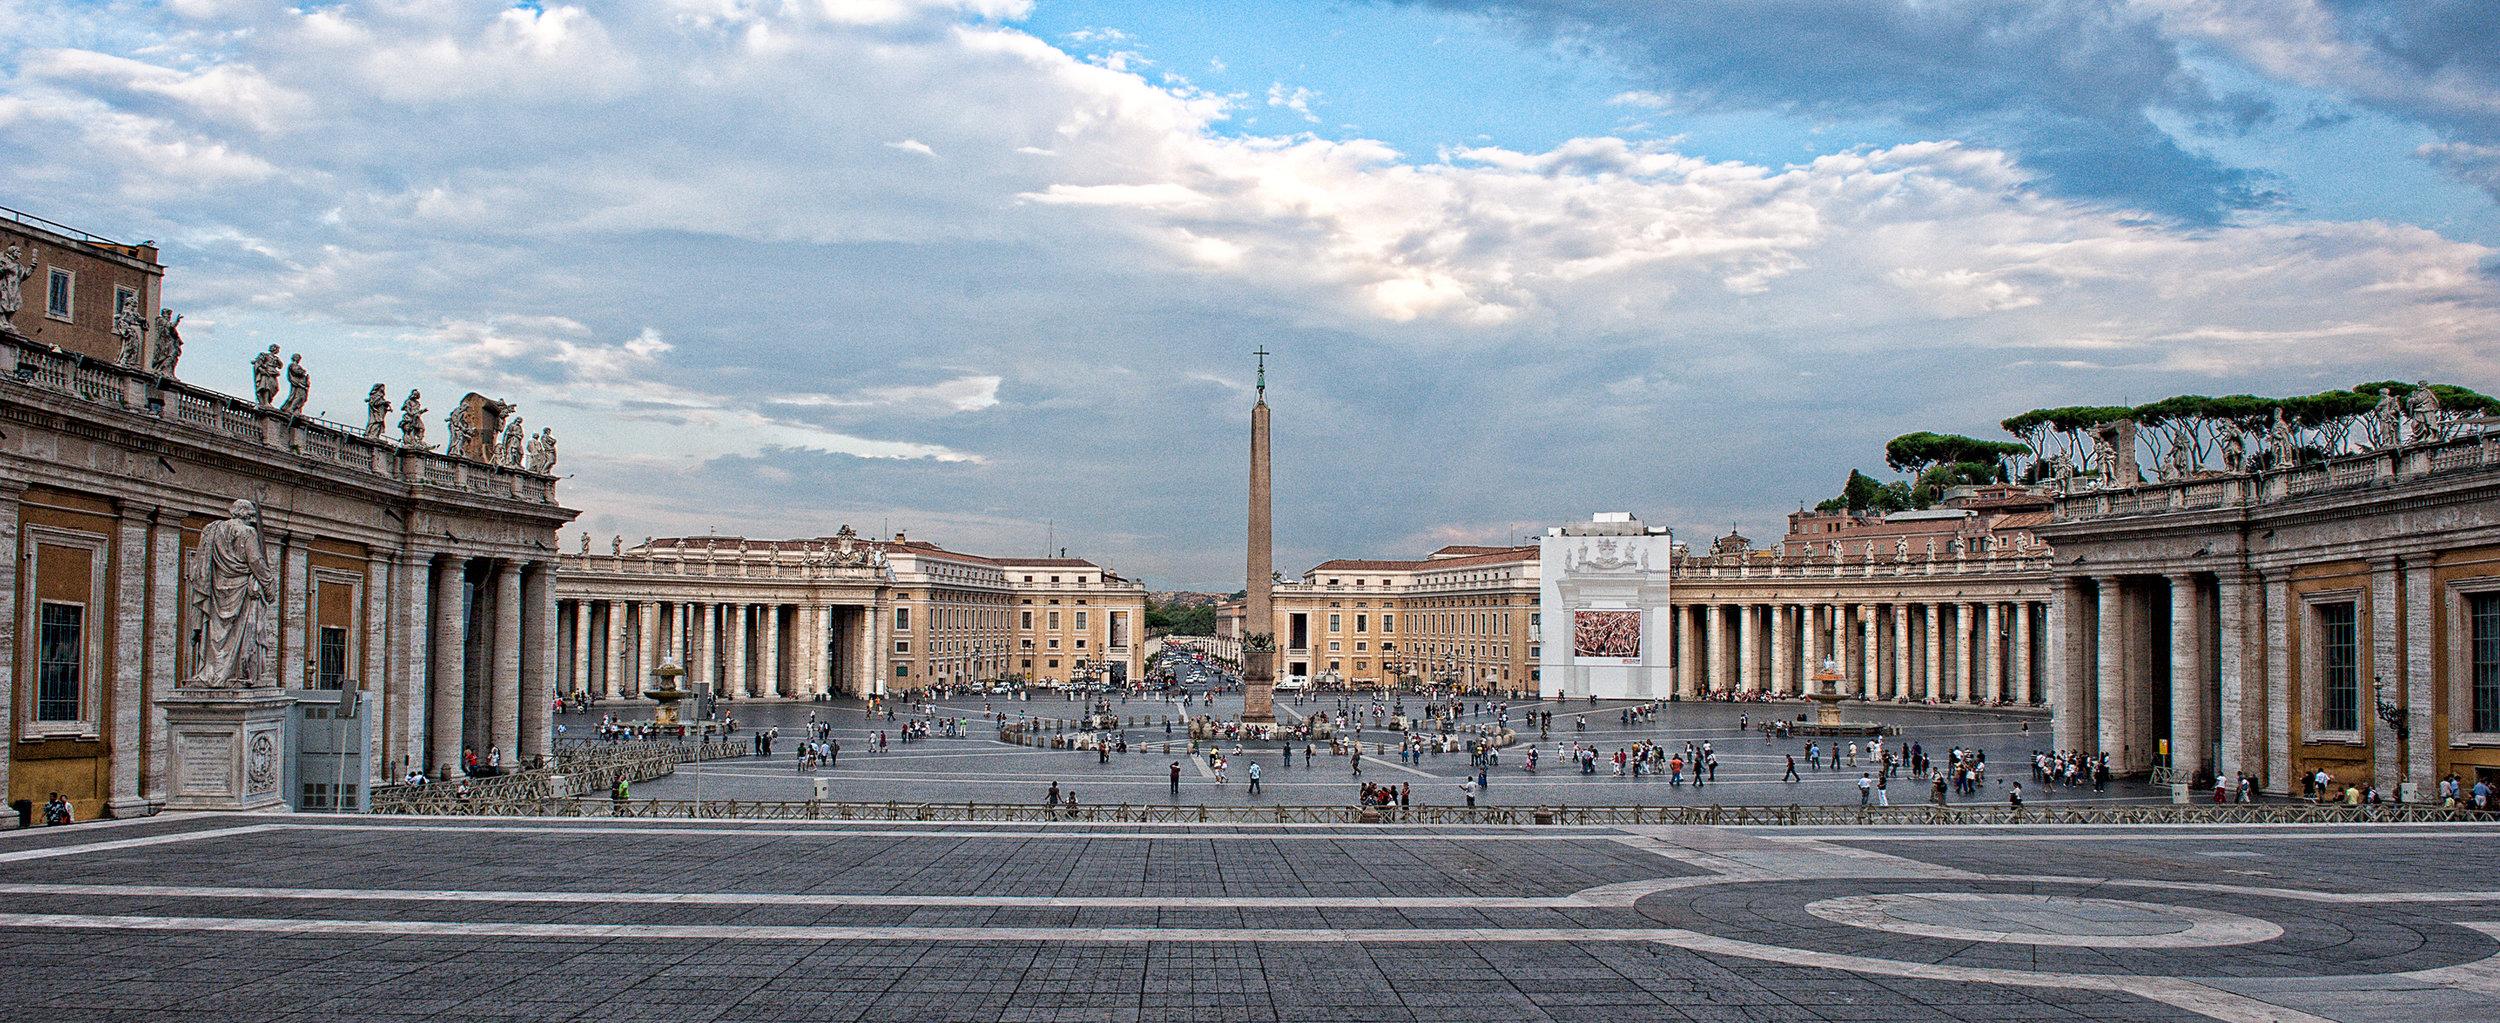 Italy-John Bardell-0679a.jpg